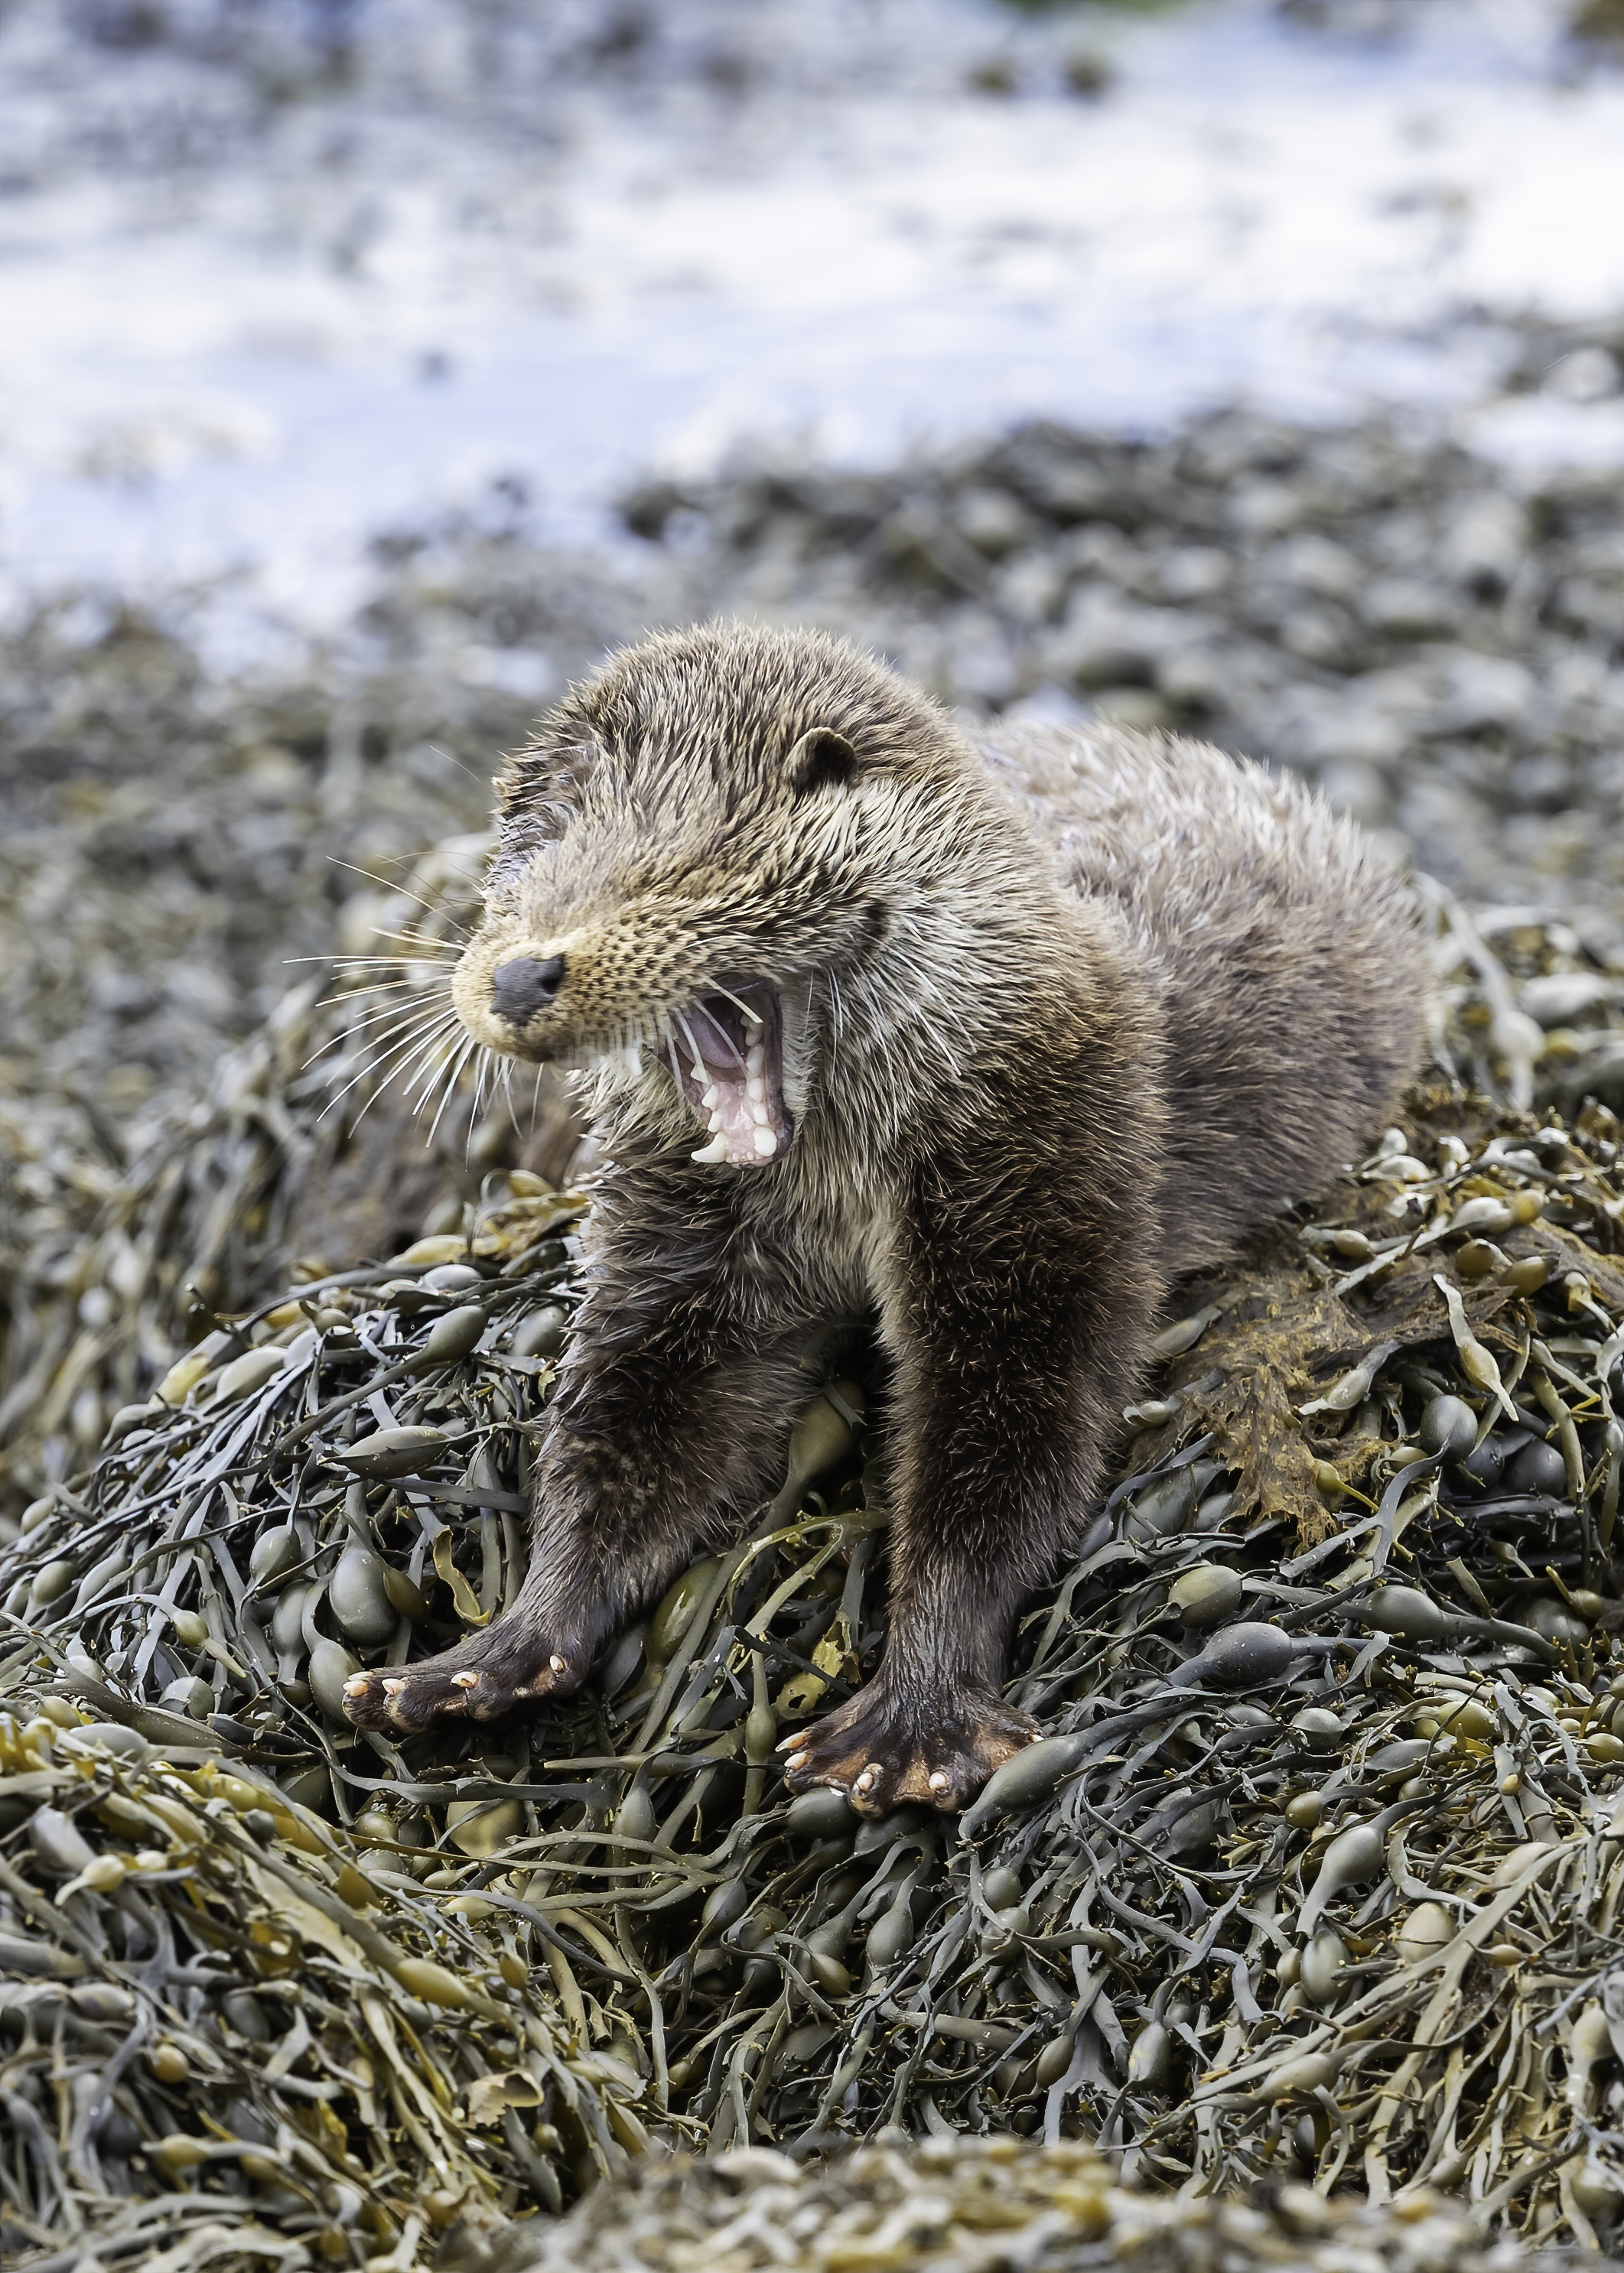 Otter Cub stretching